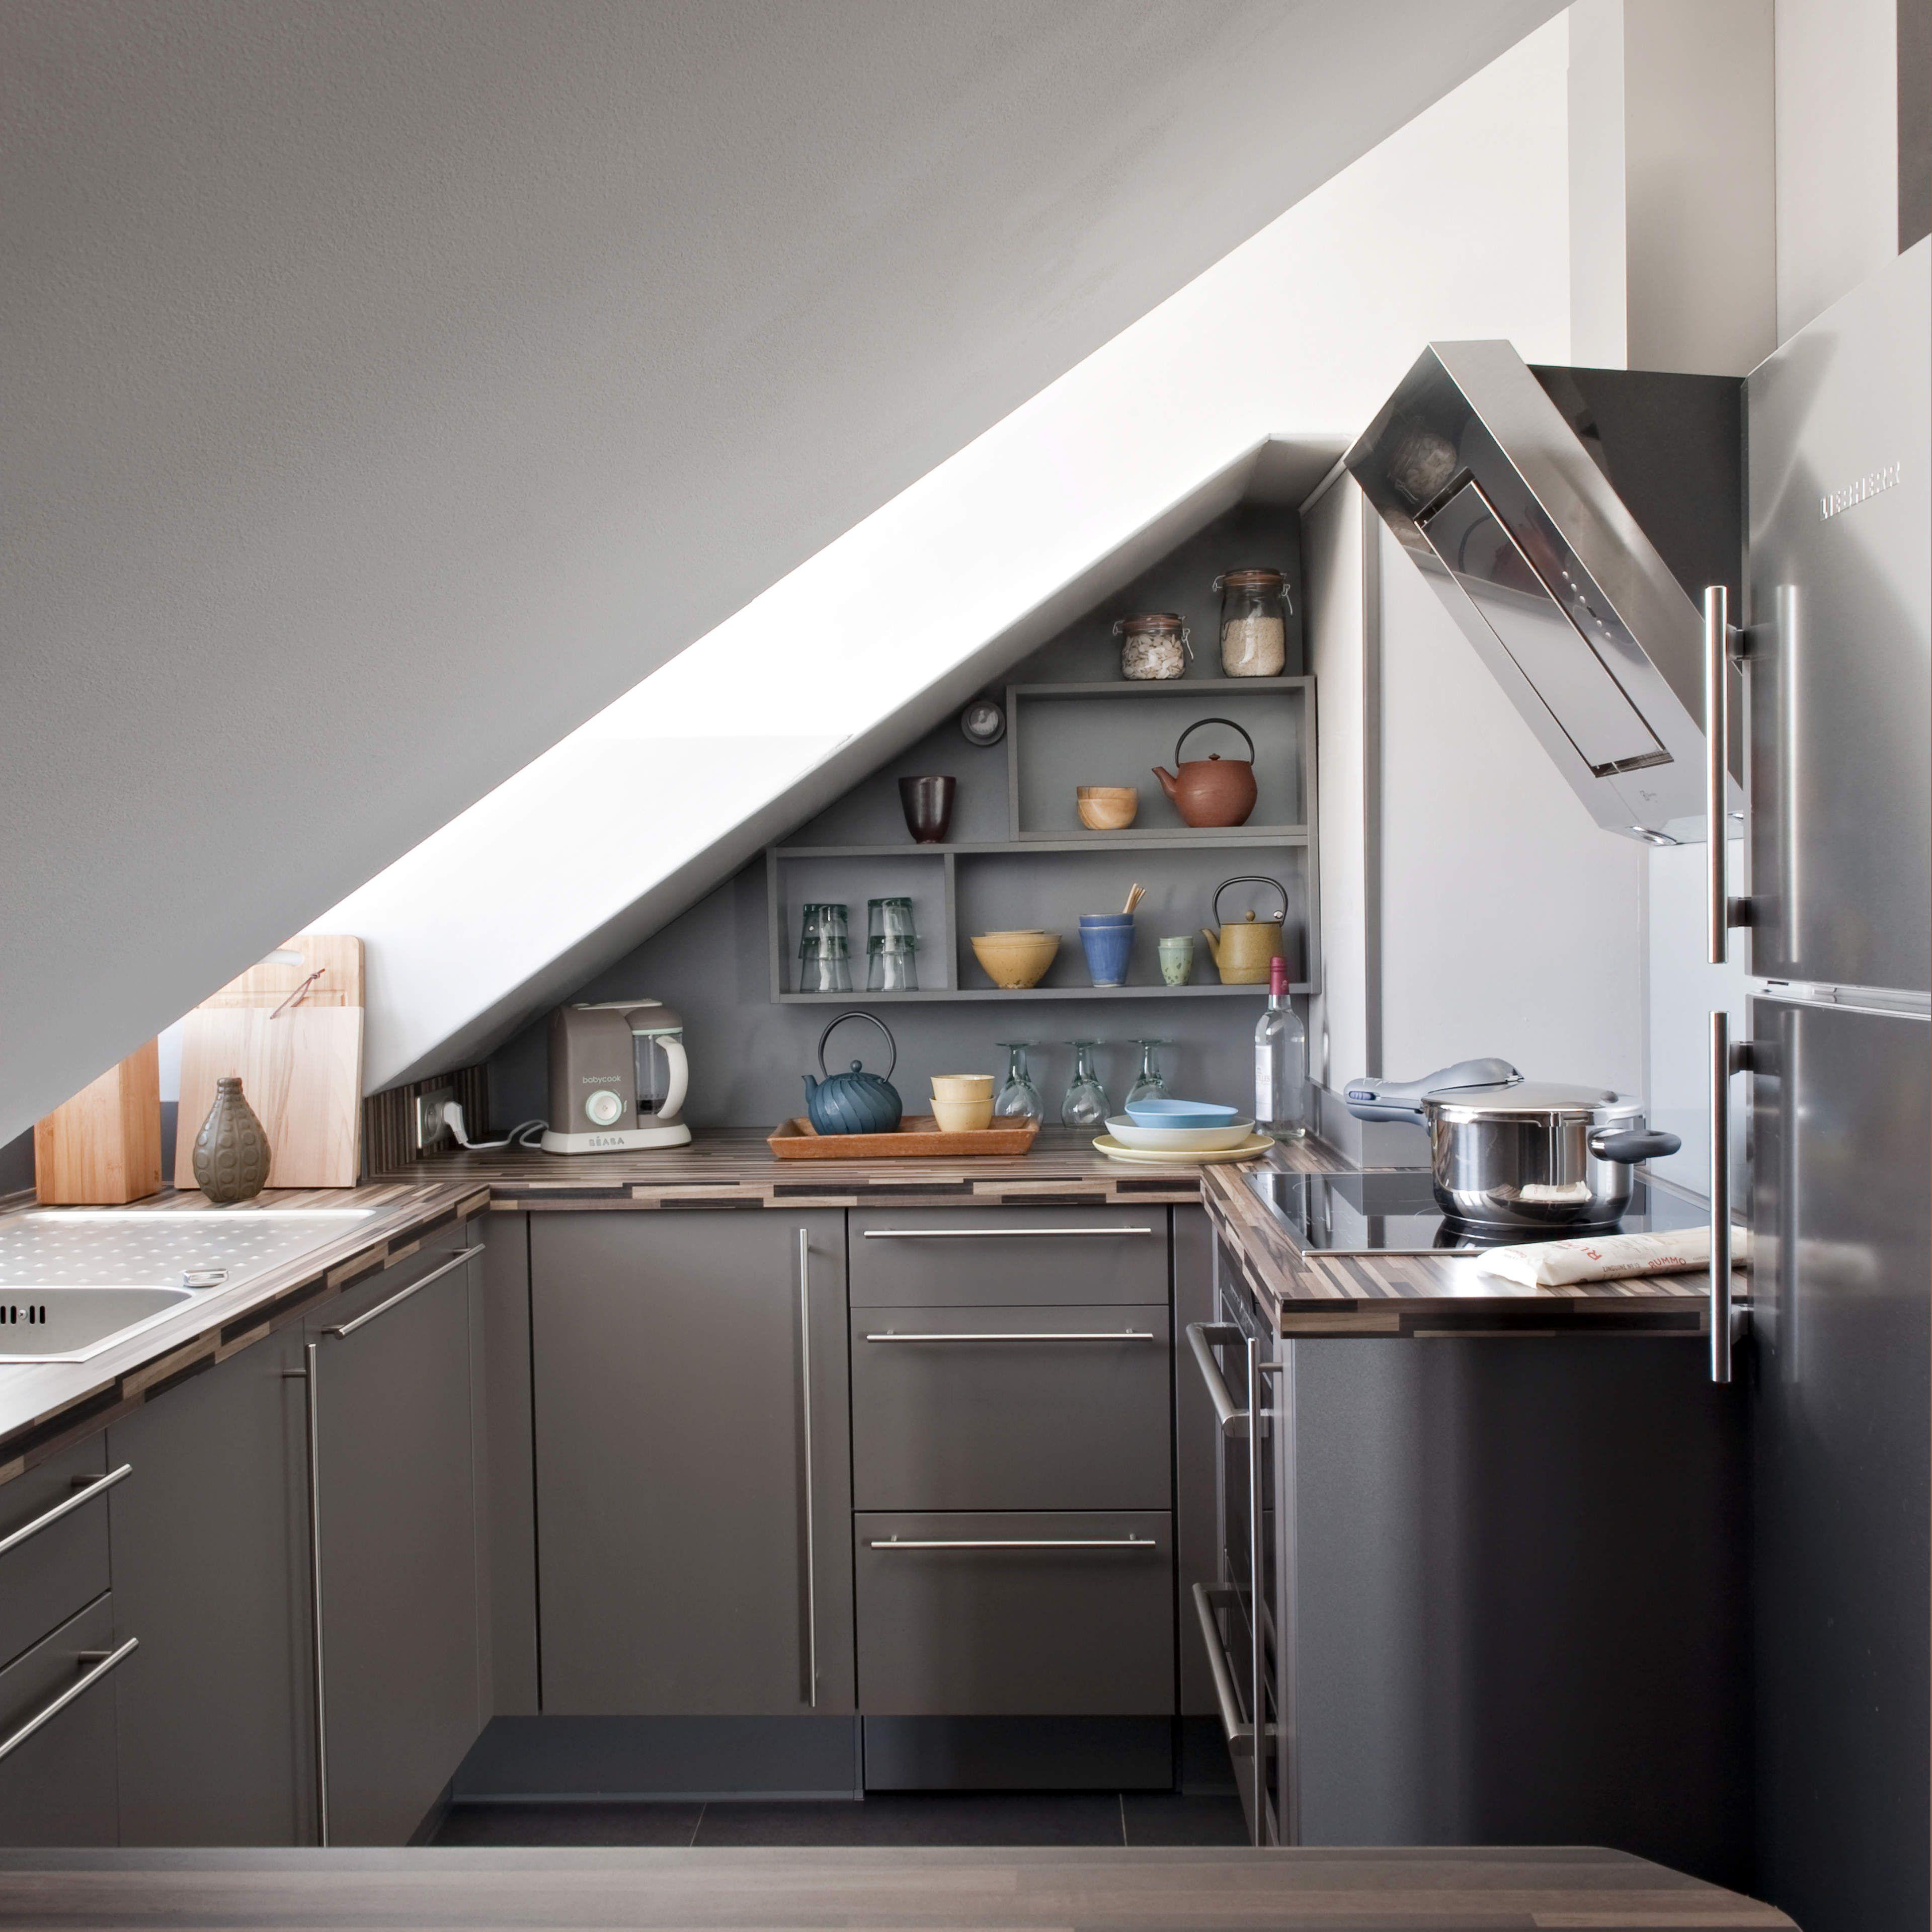 17 Captivating Attic Kitchen Designs